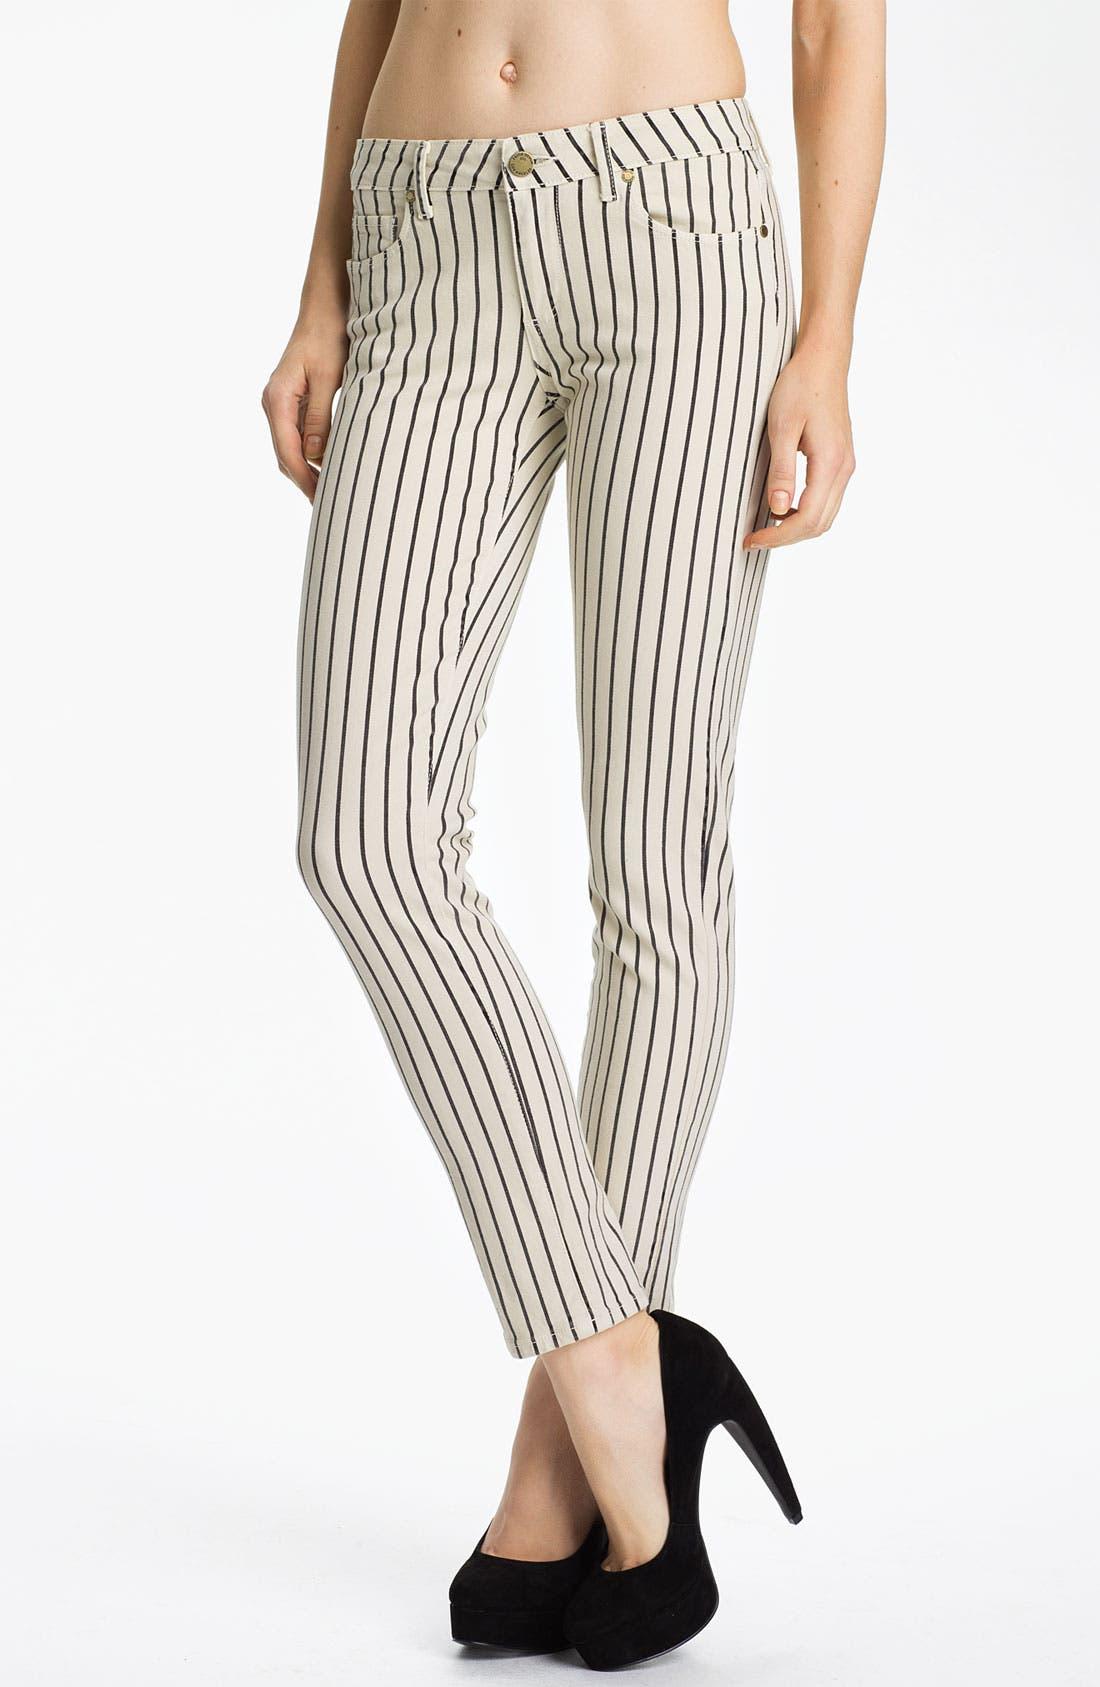 Main Image - Paige Denim 'Skyline' Ankle Peg Stripe Skinny Jeans (Birch/Black)